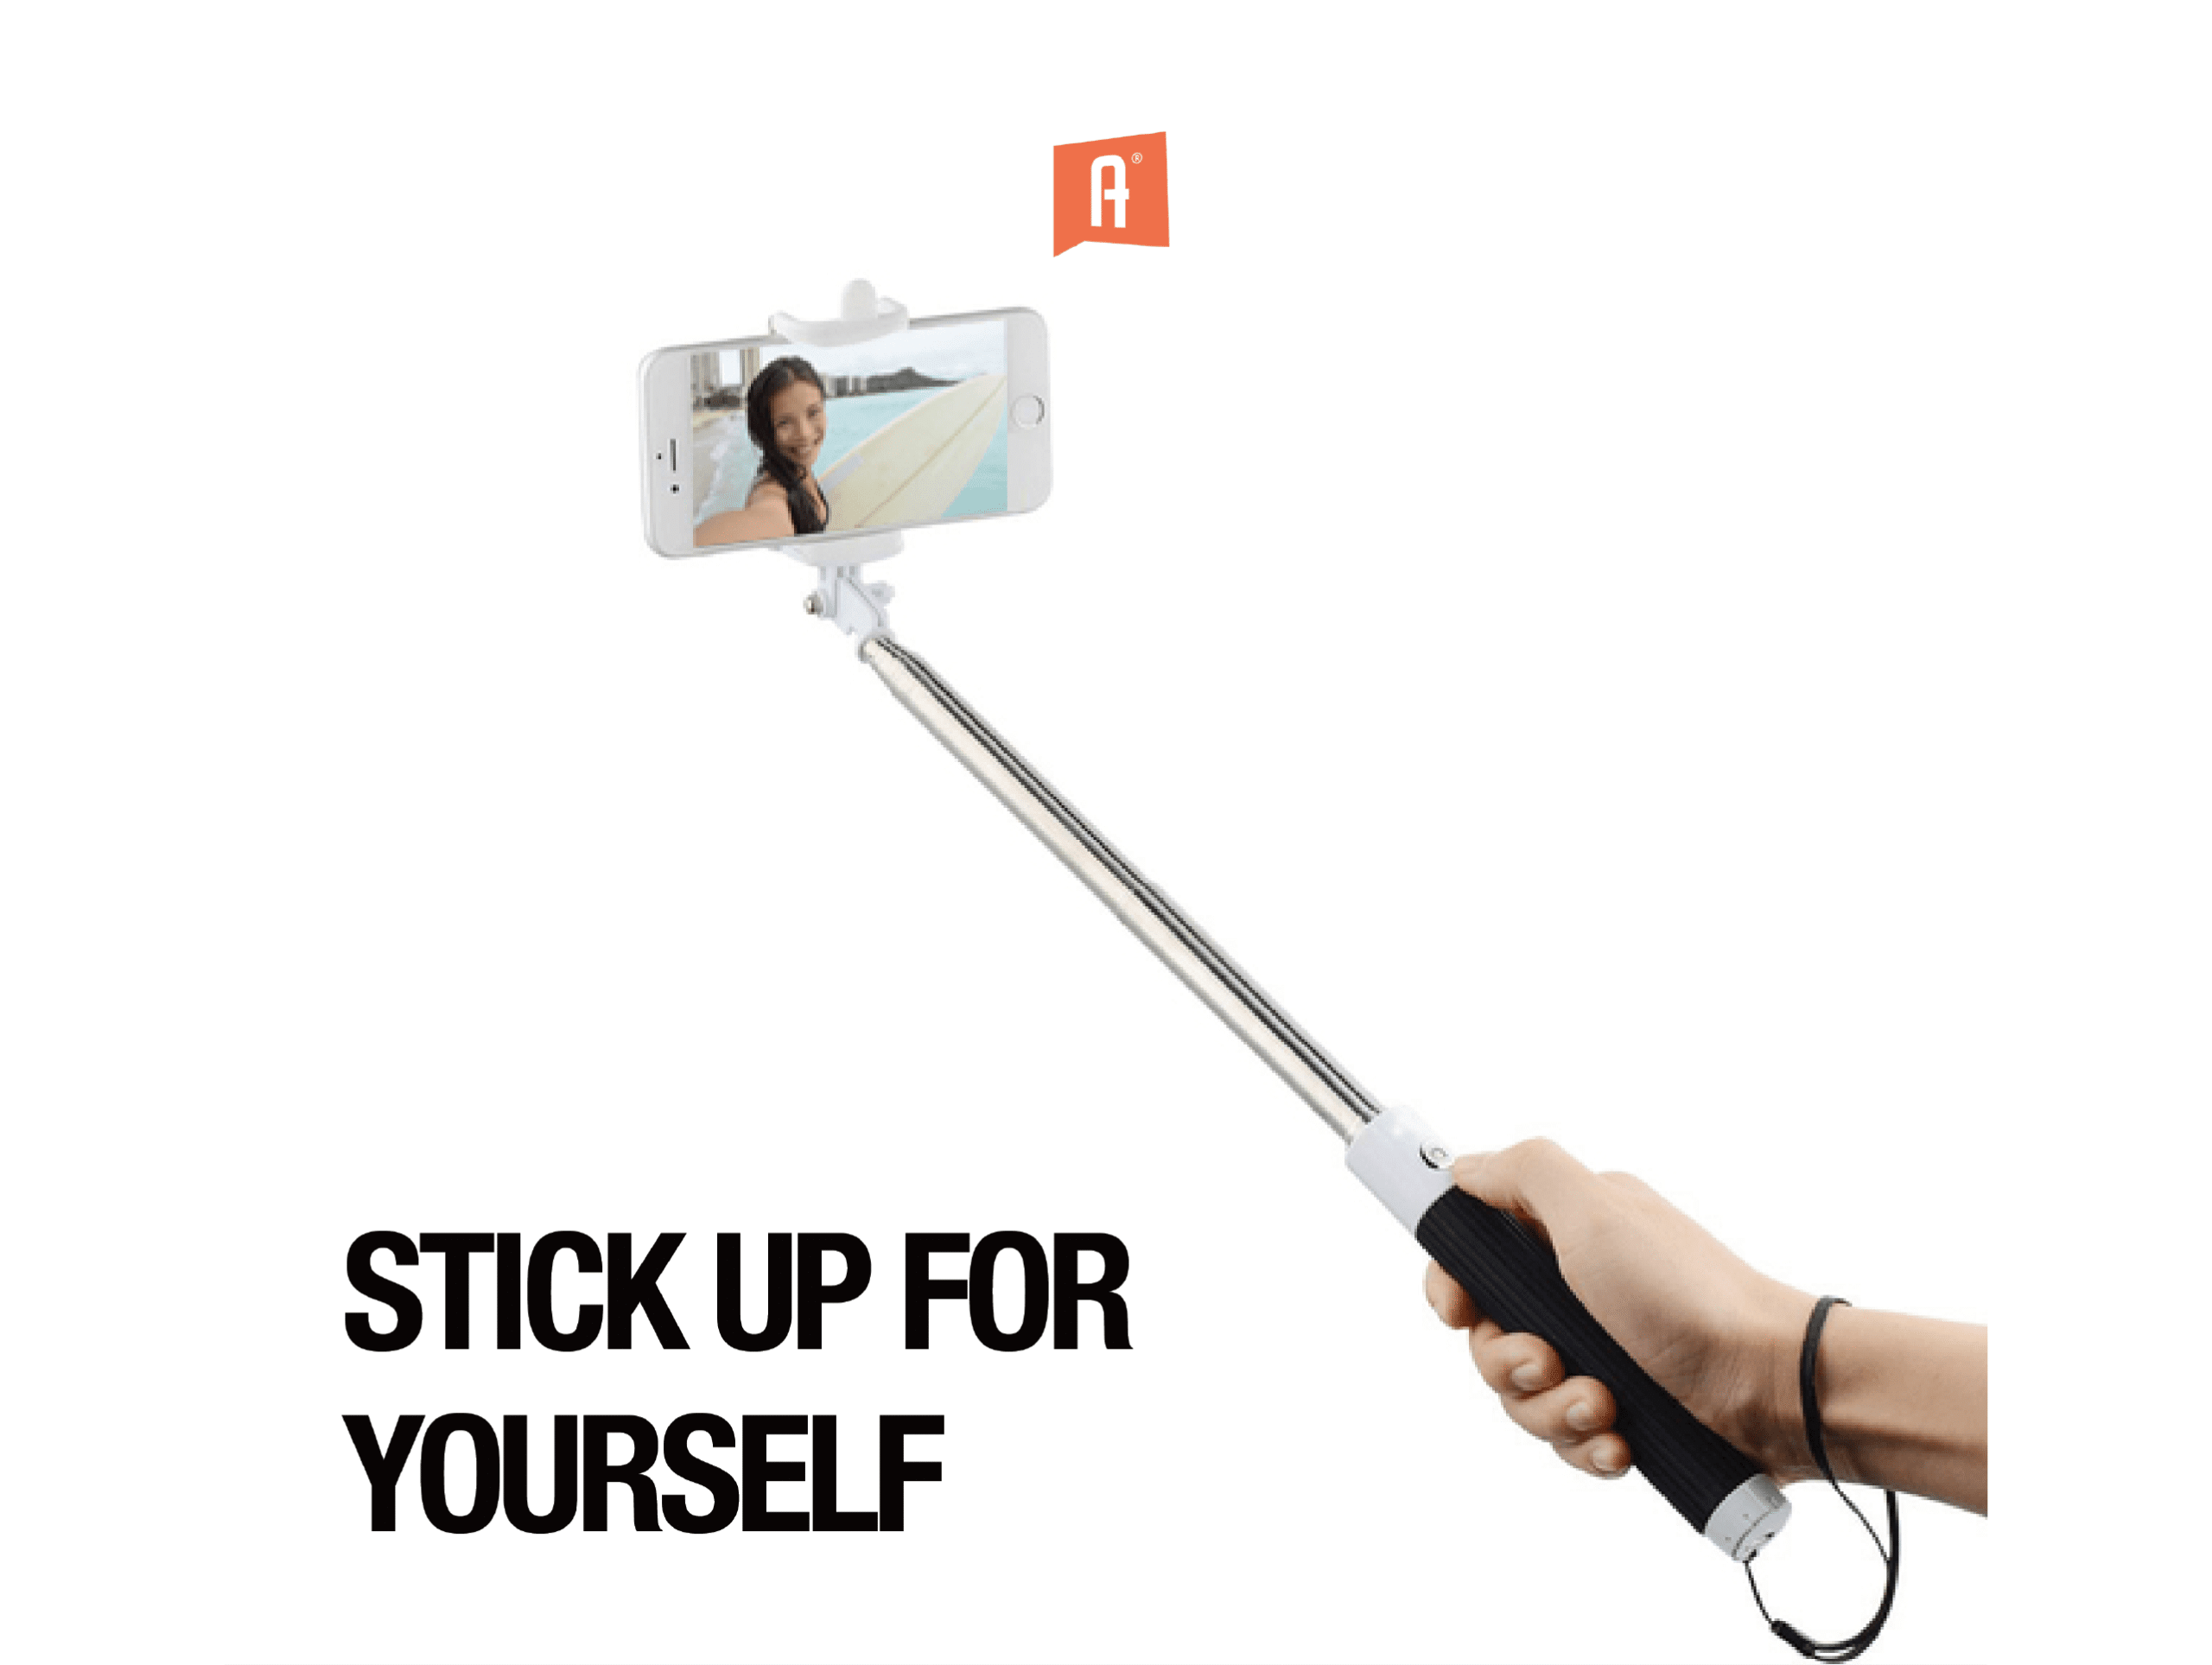 atart branded selfie stick with marketing logo